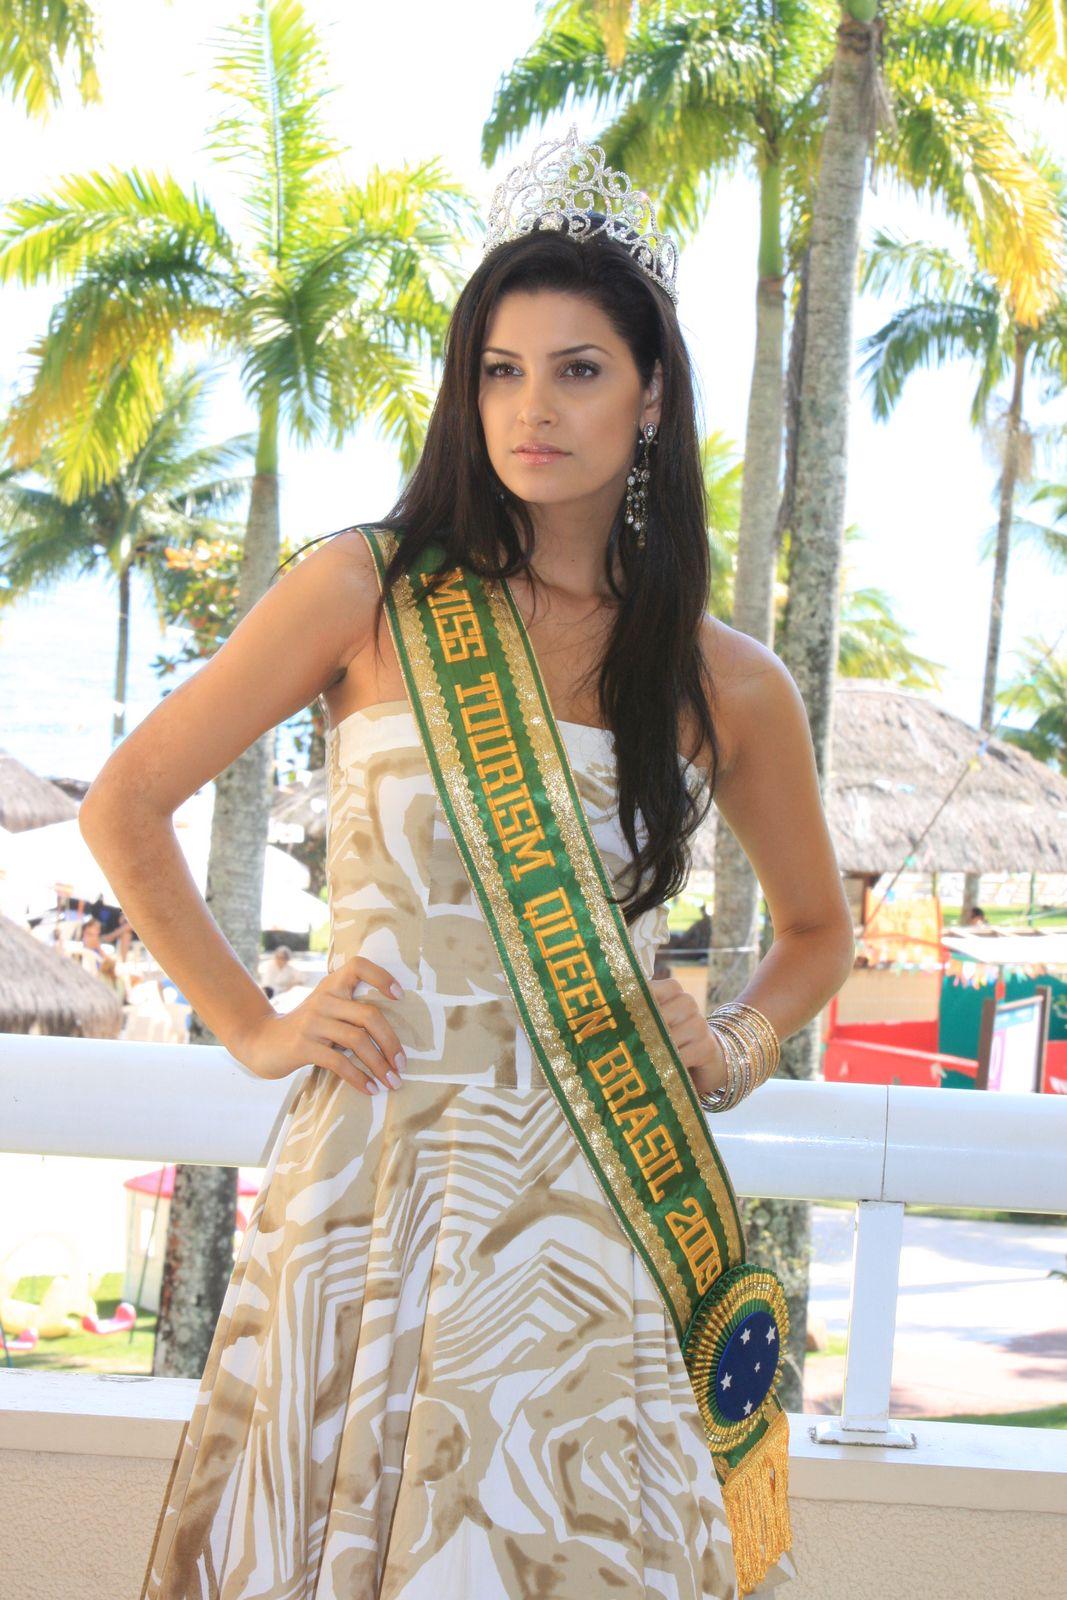 vivian noronha, rainha hispanoamericana 2008. suplente. - Página 4 Jzvx4q66